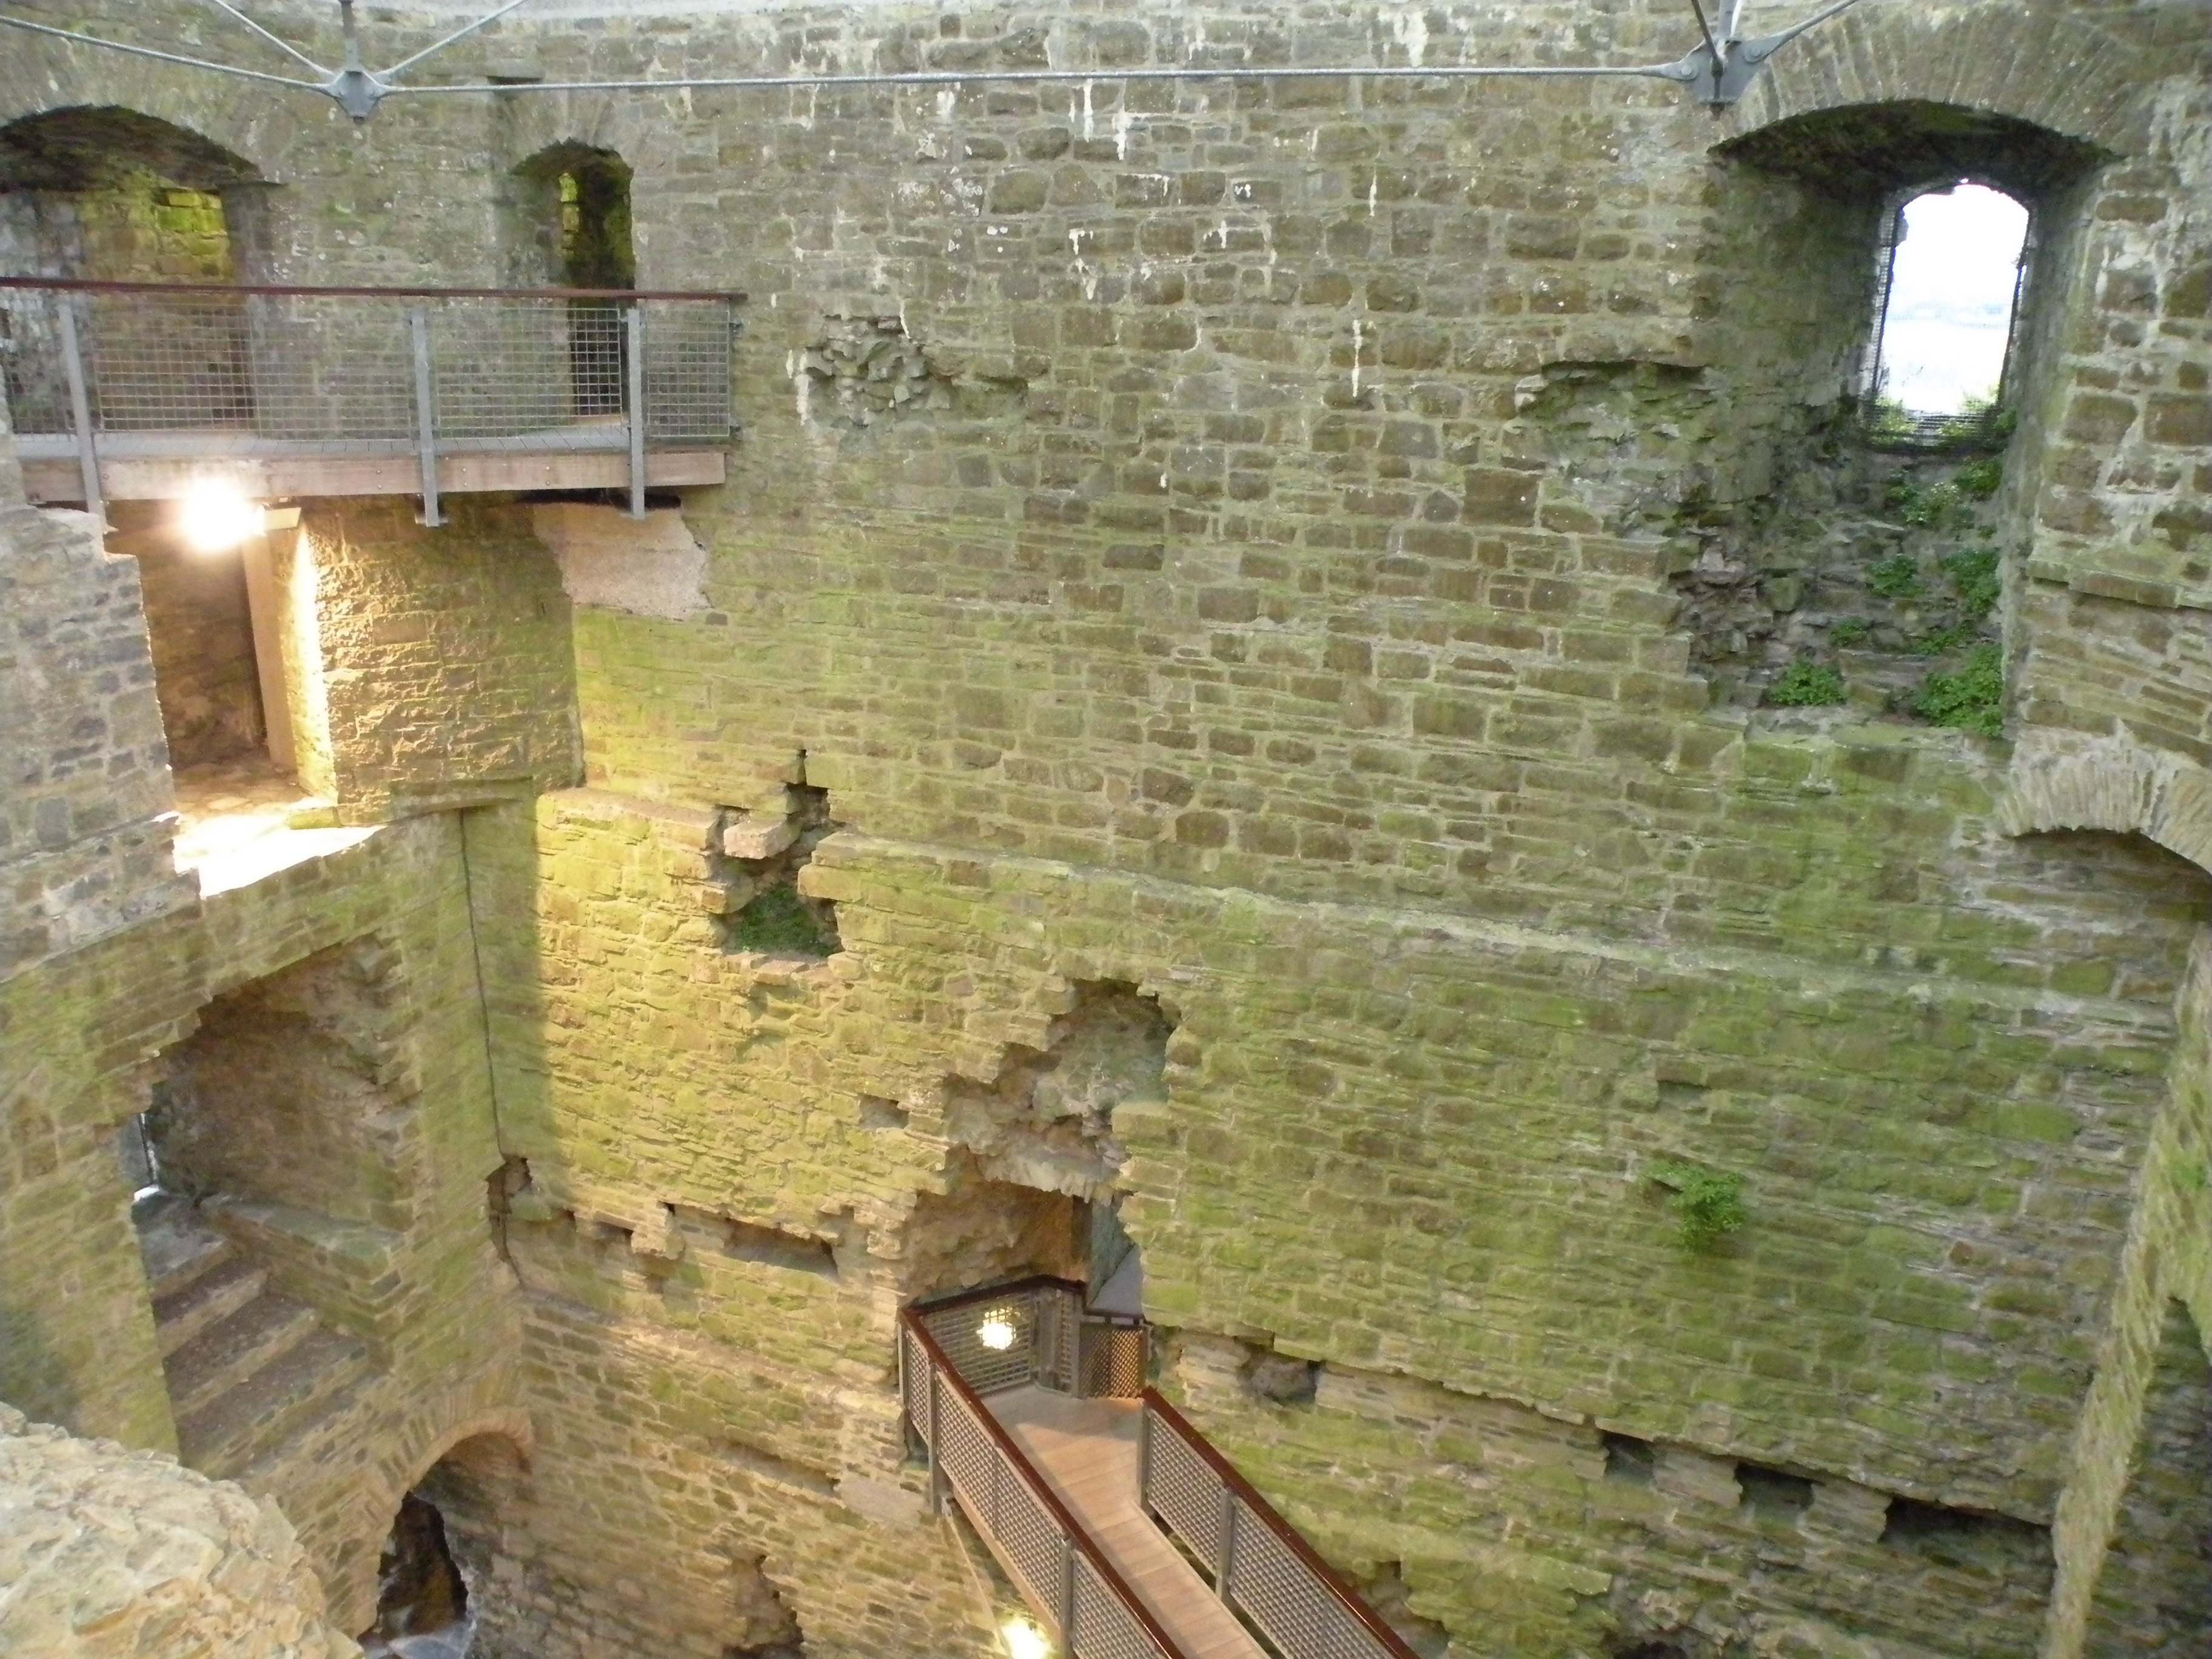 trim castle cistercian abby and hill of tara zen brush